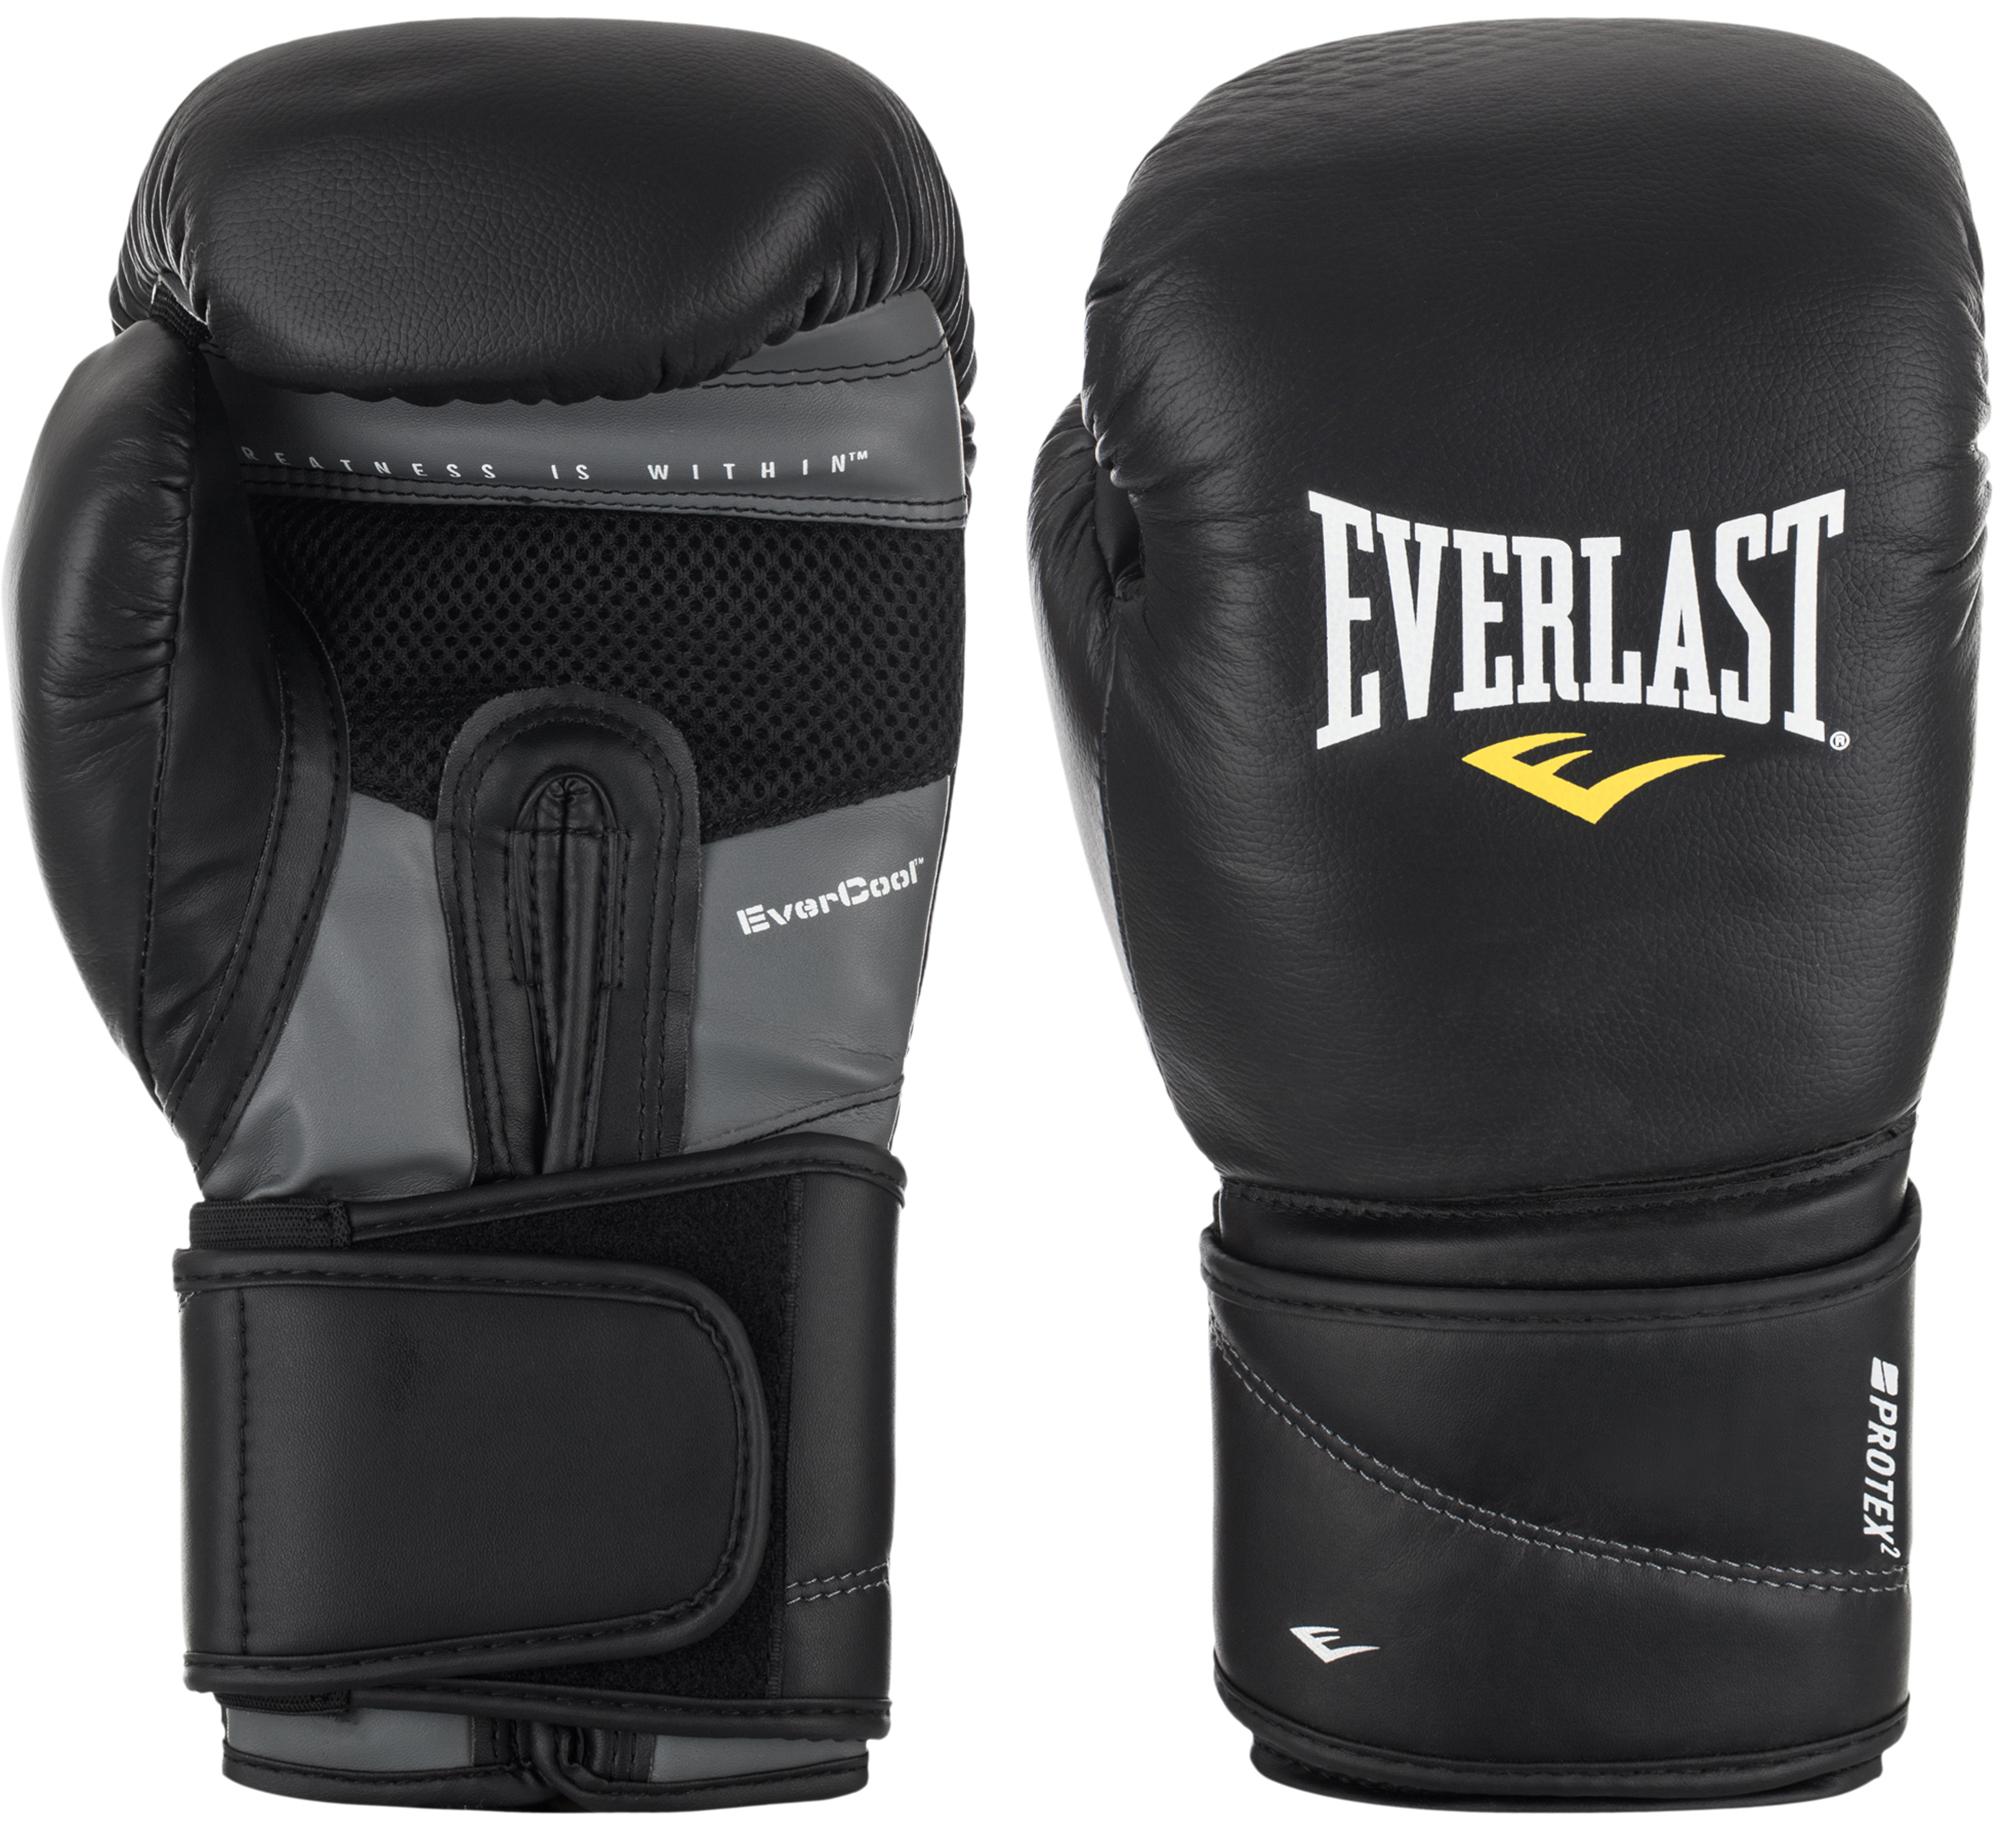 все цены на Everlast Перчатки боксерские Everlast Protex2 Leather, размер 14 oz/S-M